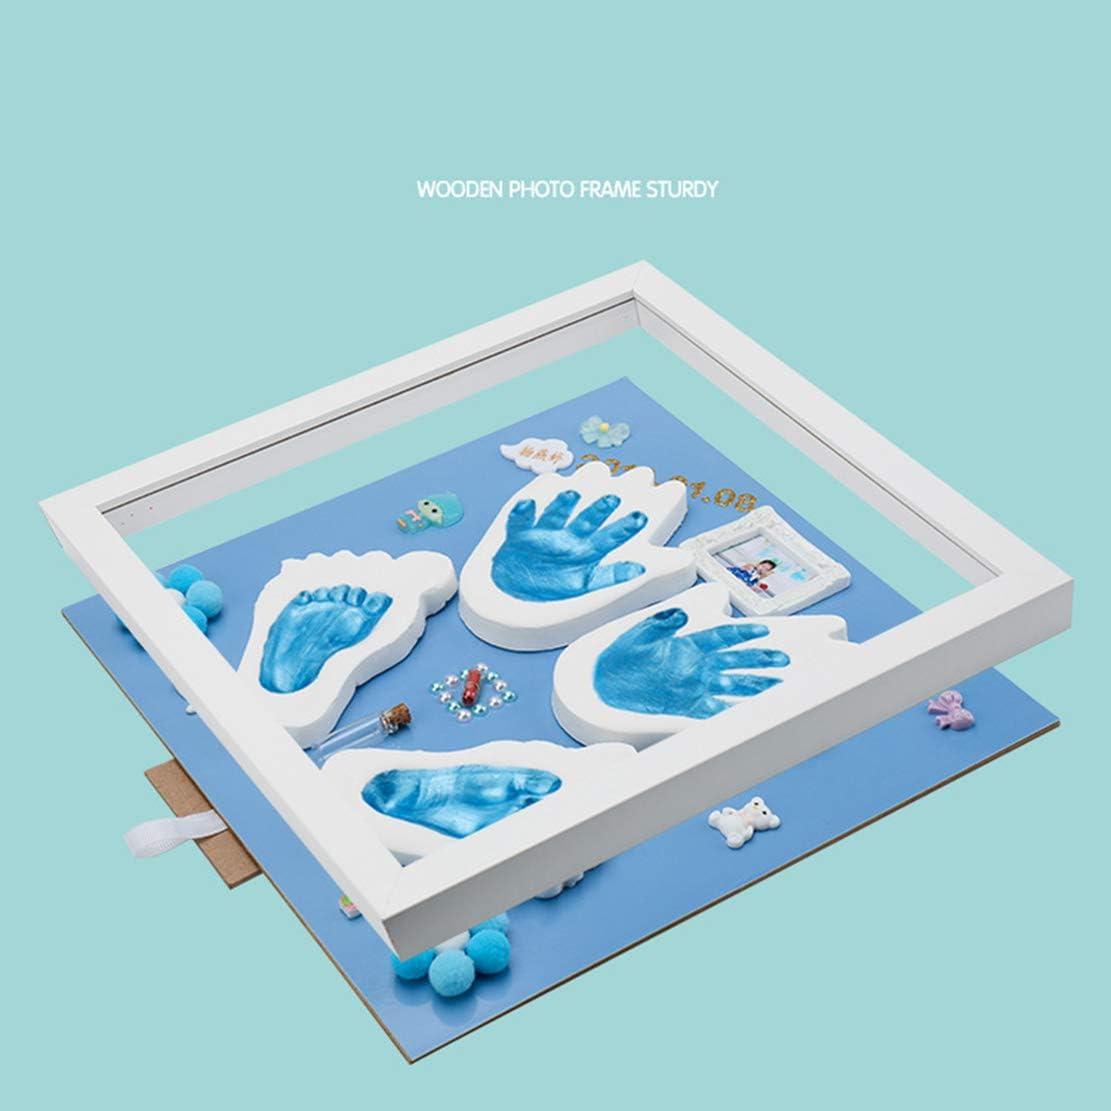 3 Years Clay Handprint Kit 0 Month White and Grey Hoverex Baby Art Magic Box